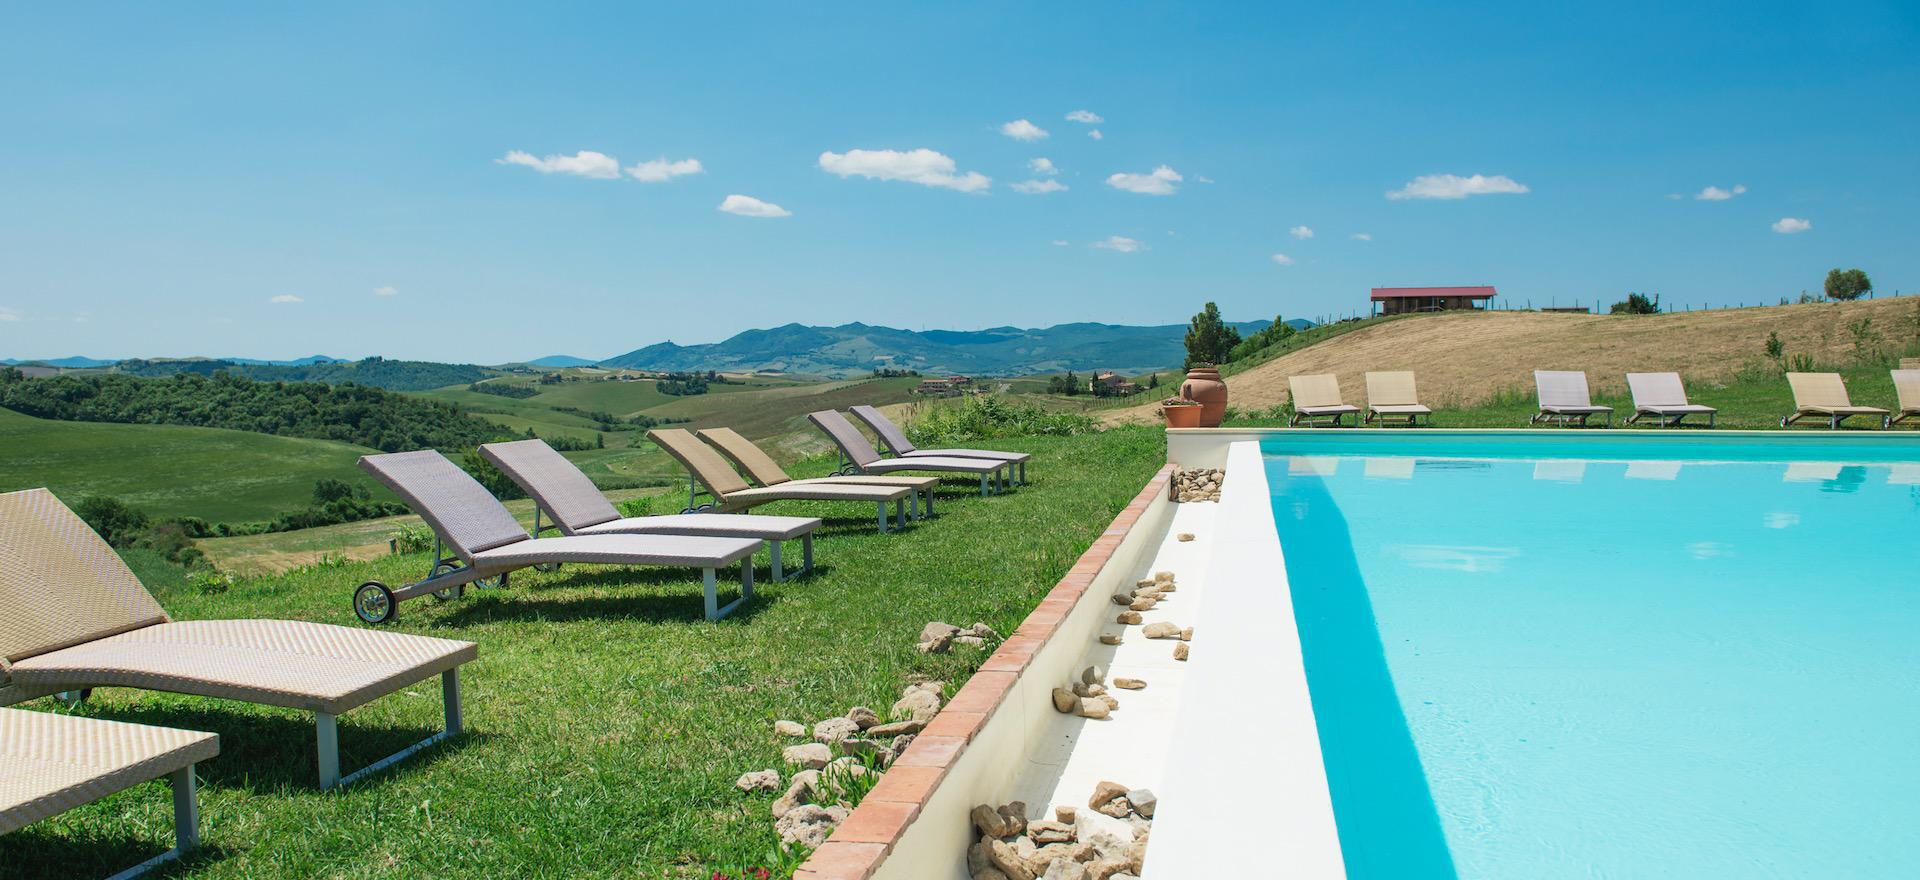 Agriturismo Toscane Gezellige agriturismo met panoramisch zwembad in Toscane